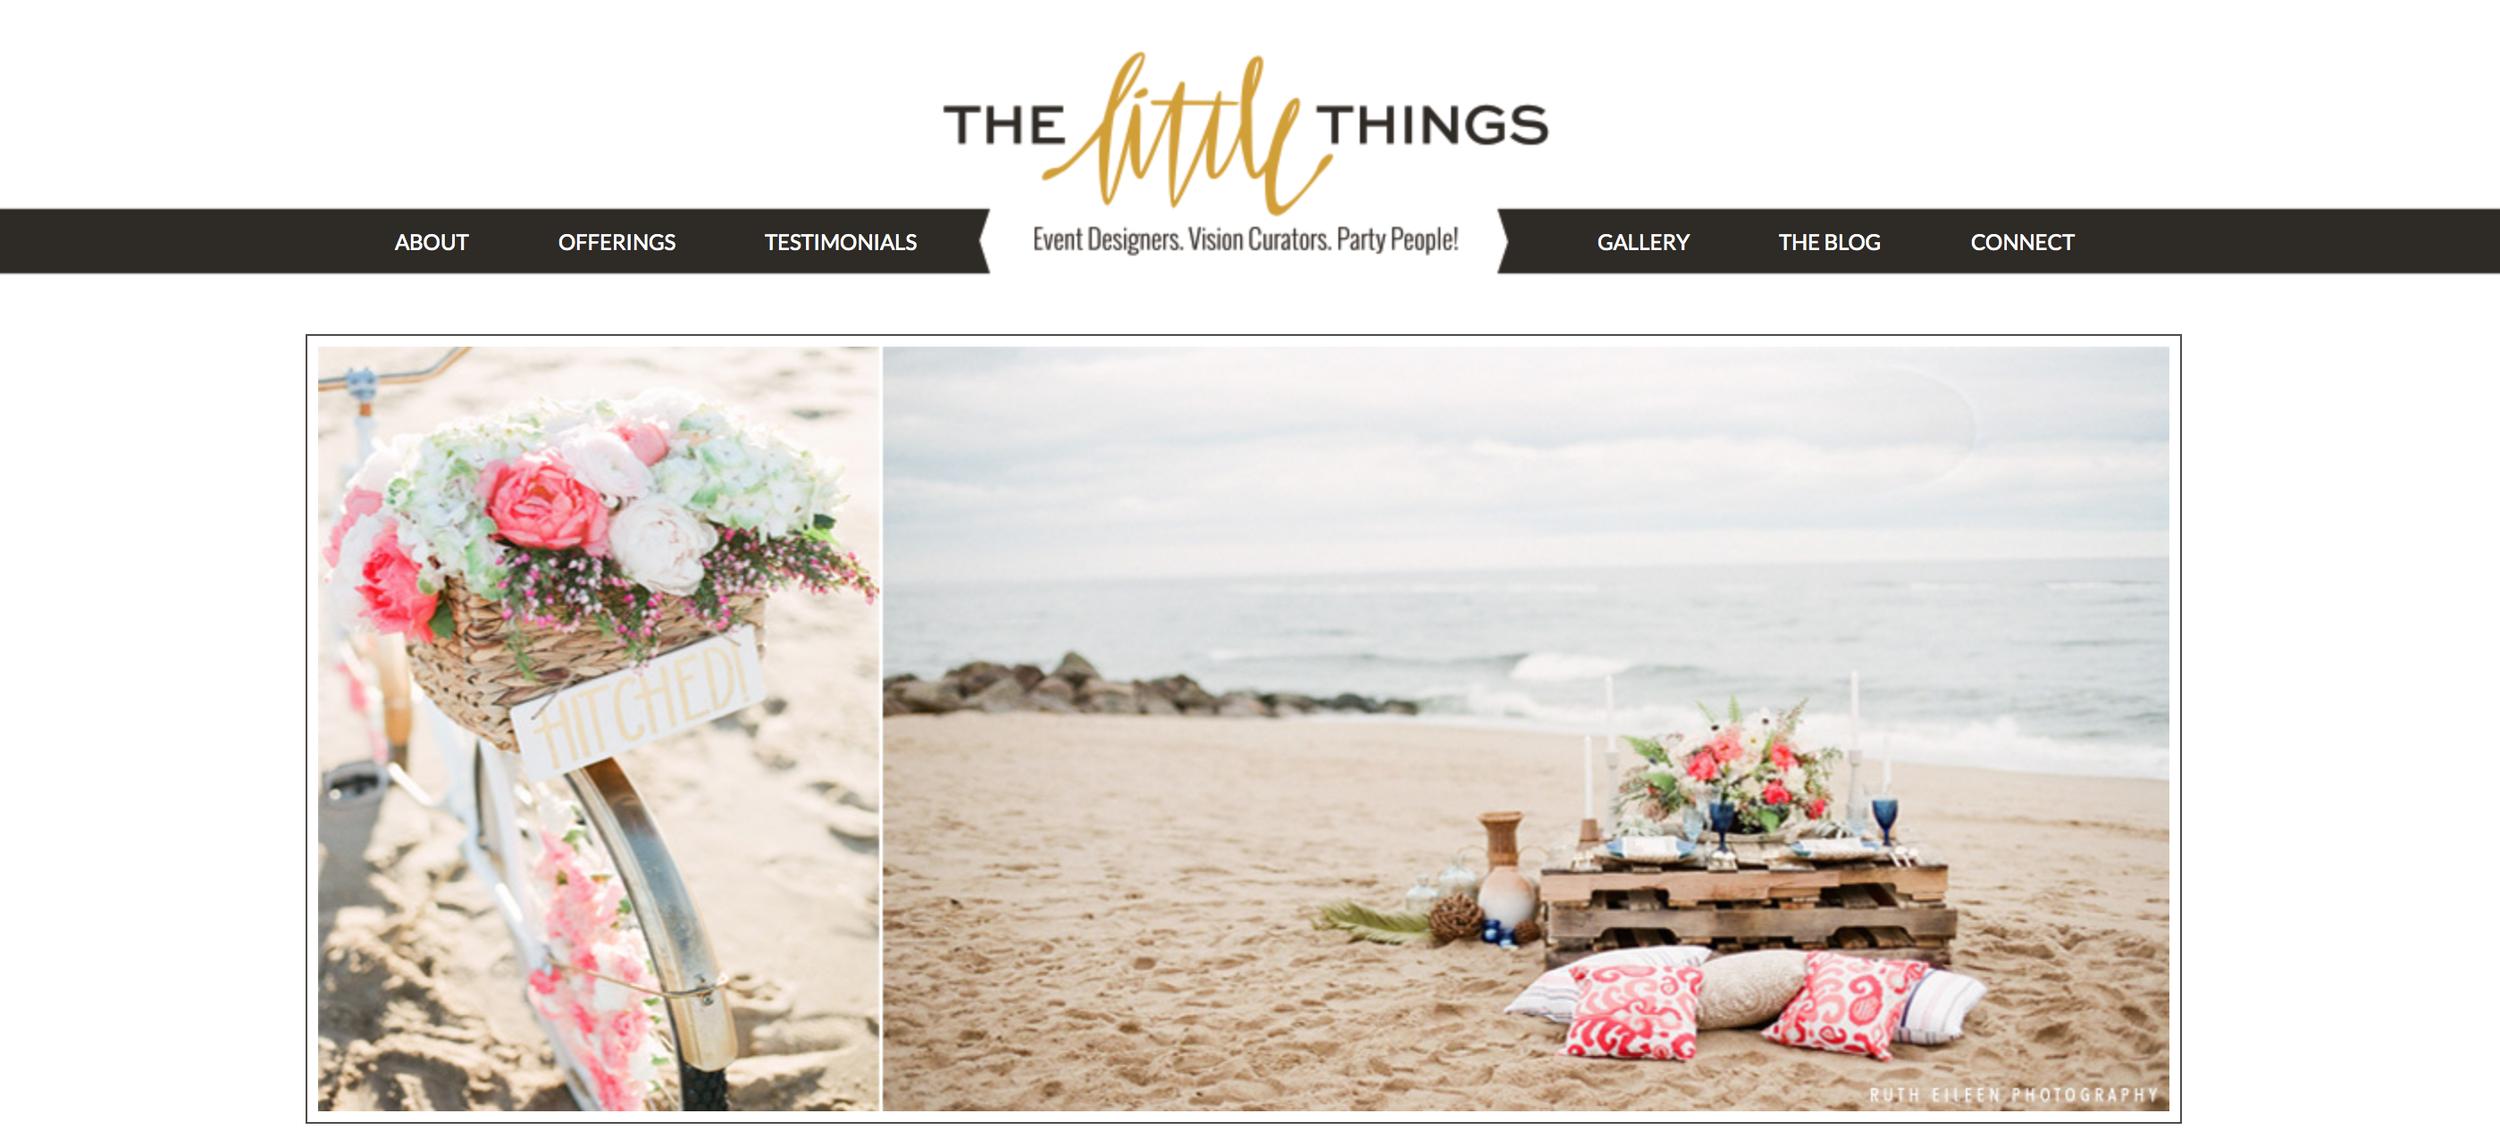 www.itstlt.com : The best Design & Wedding / Event Coordination all in one!